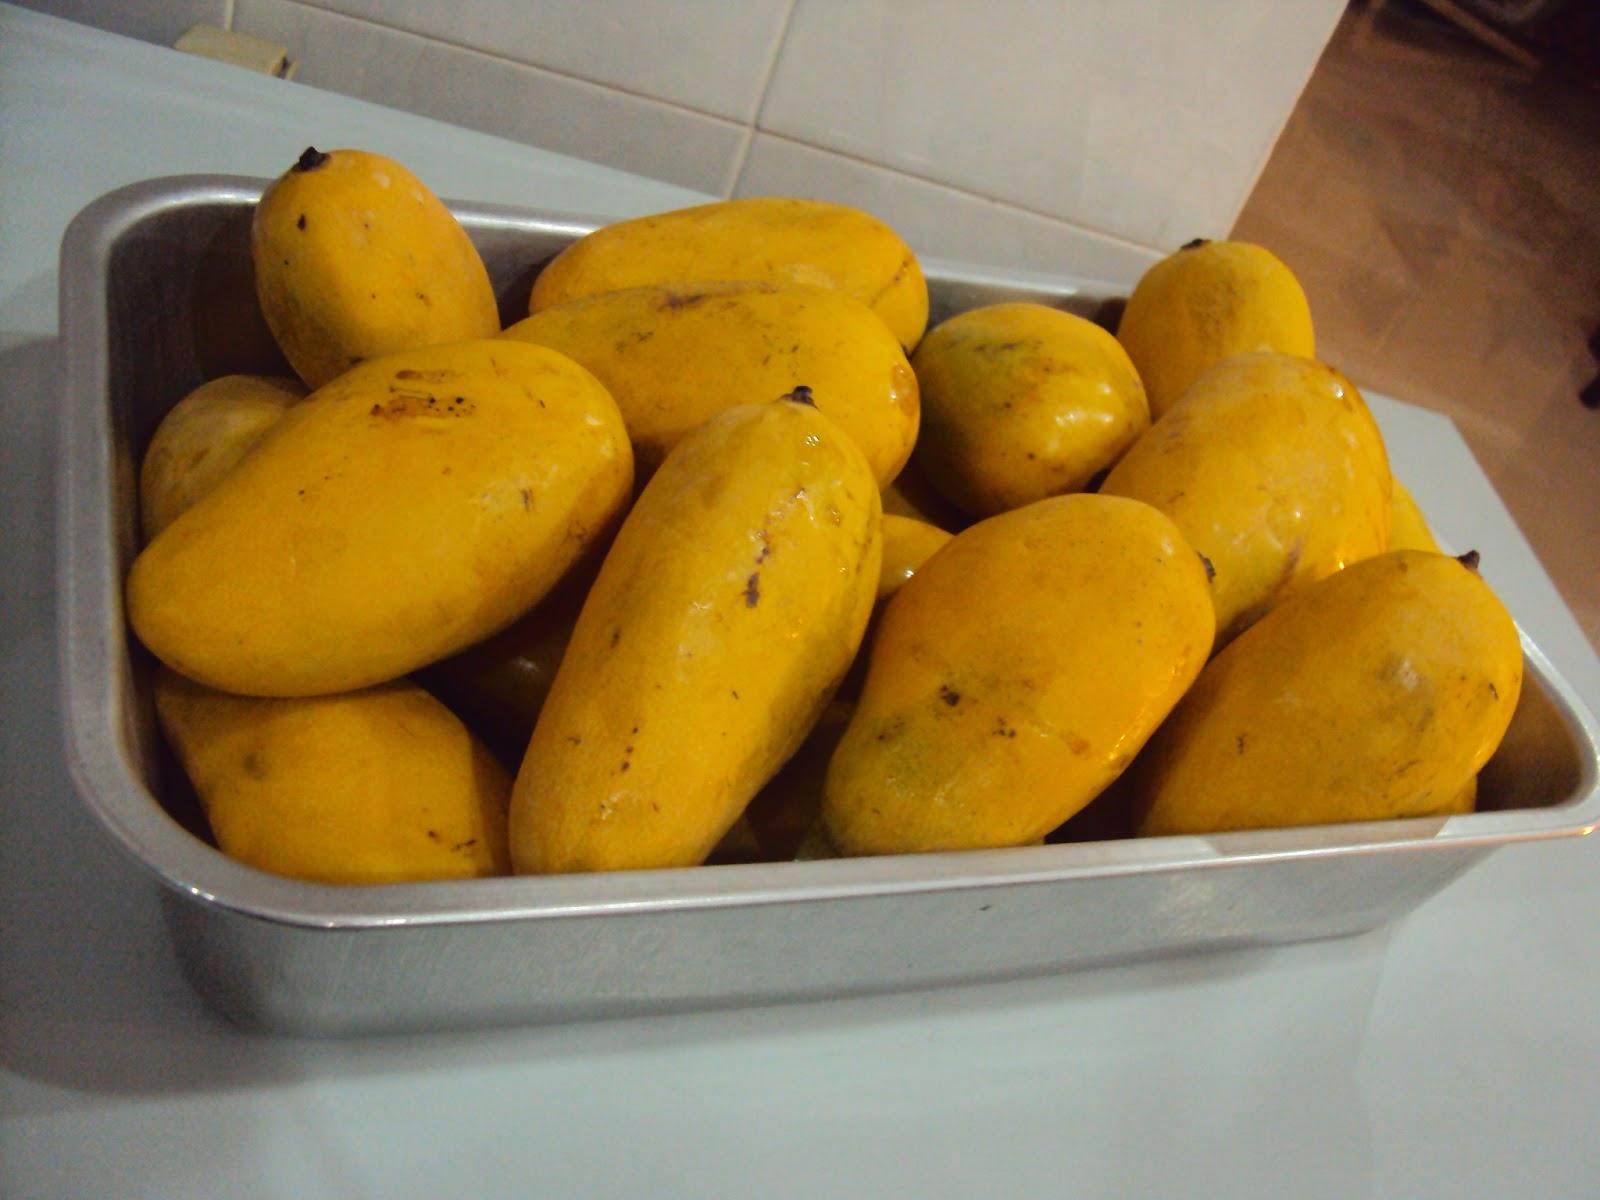 Thailand Rainbow Mango Chokanan Mangoes From Thailand